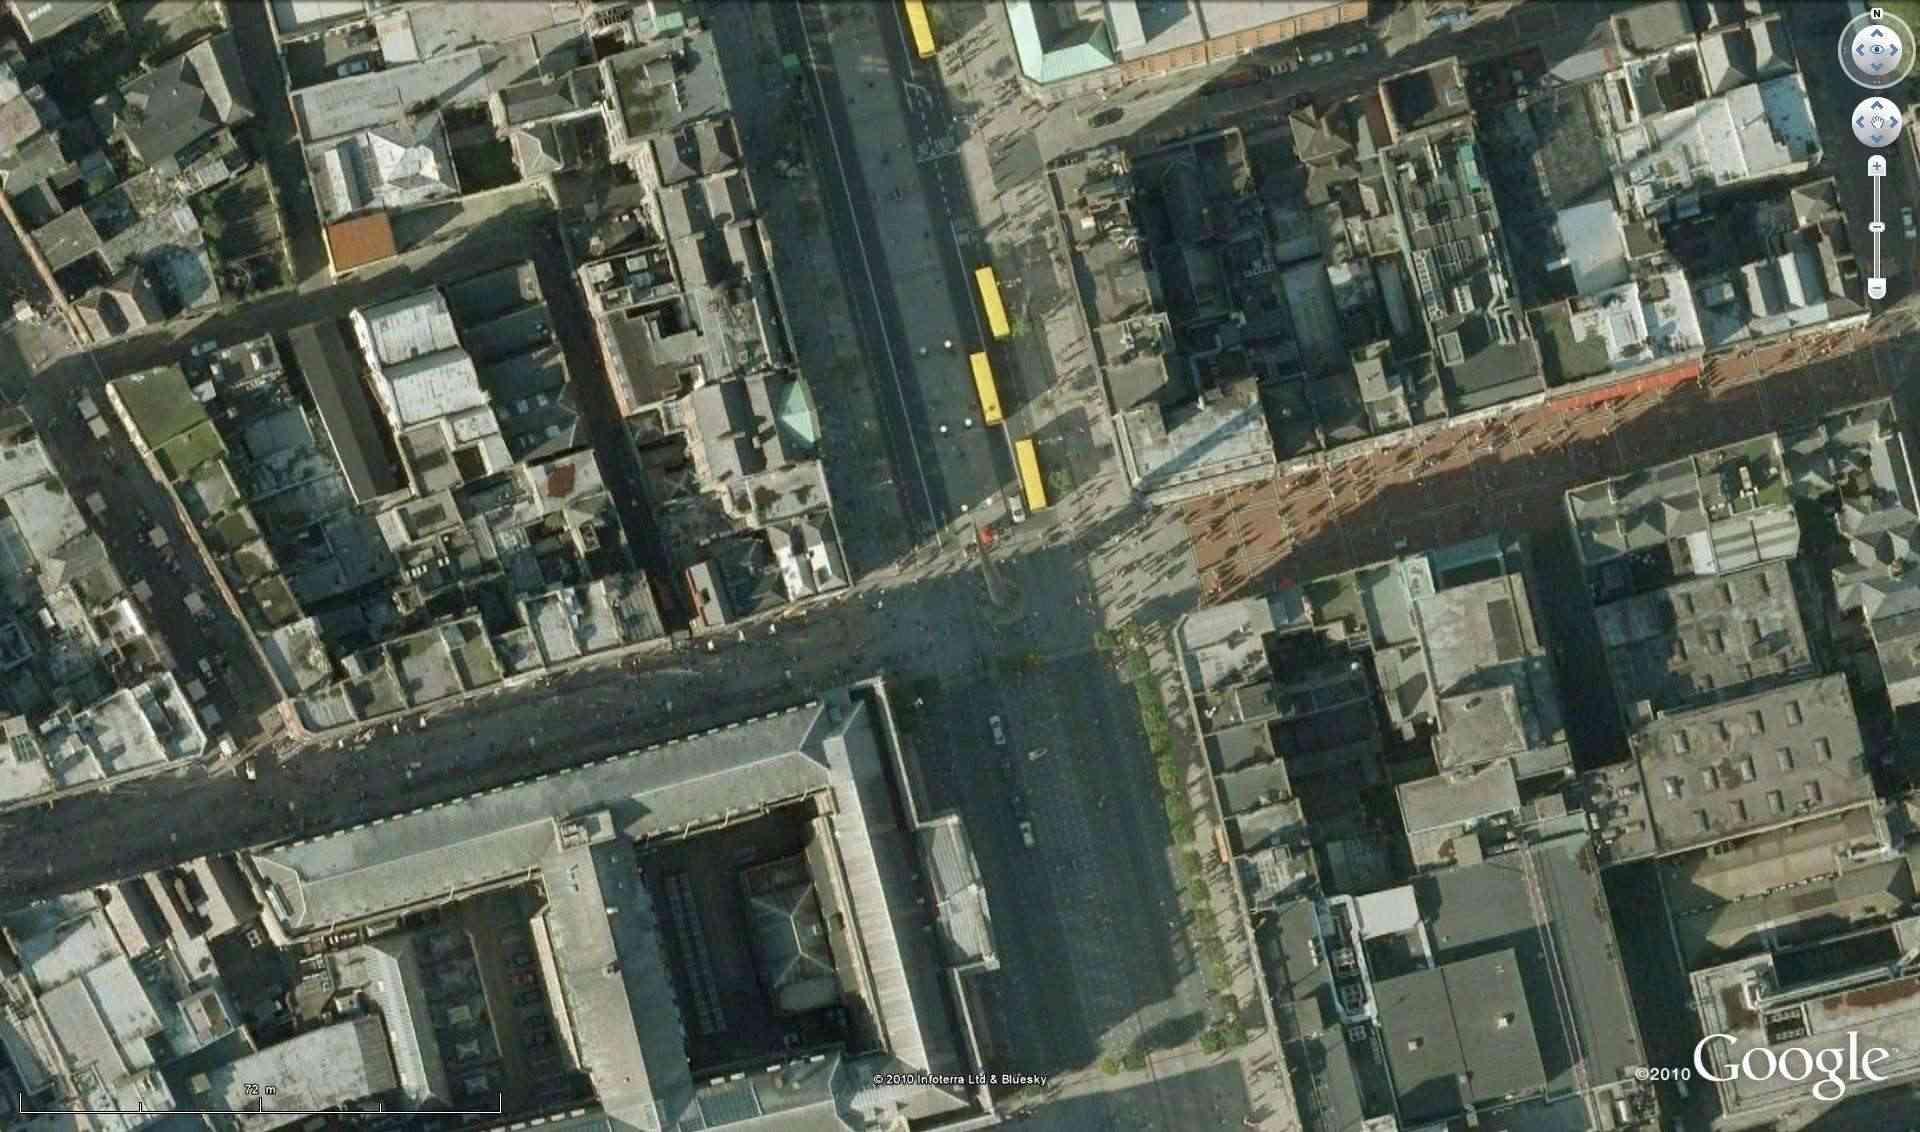 "The Spire of Dublin, Dublin, Irlande, 53°20'59.21""N 6°15'36.98""W [Défi trouvé] Defi_d11"